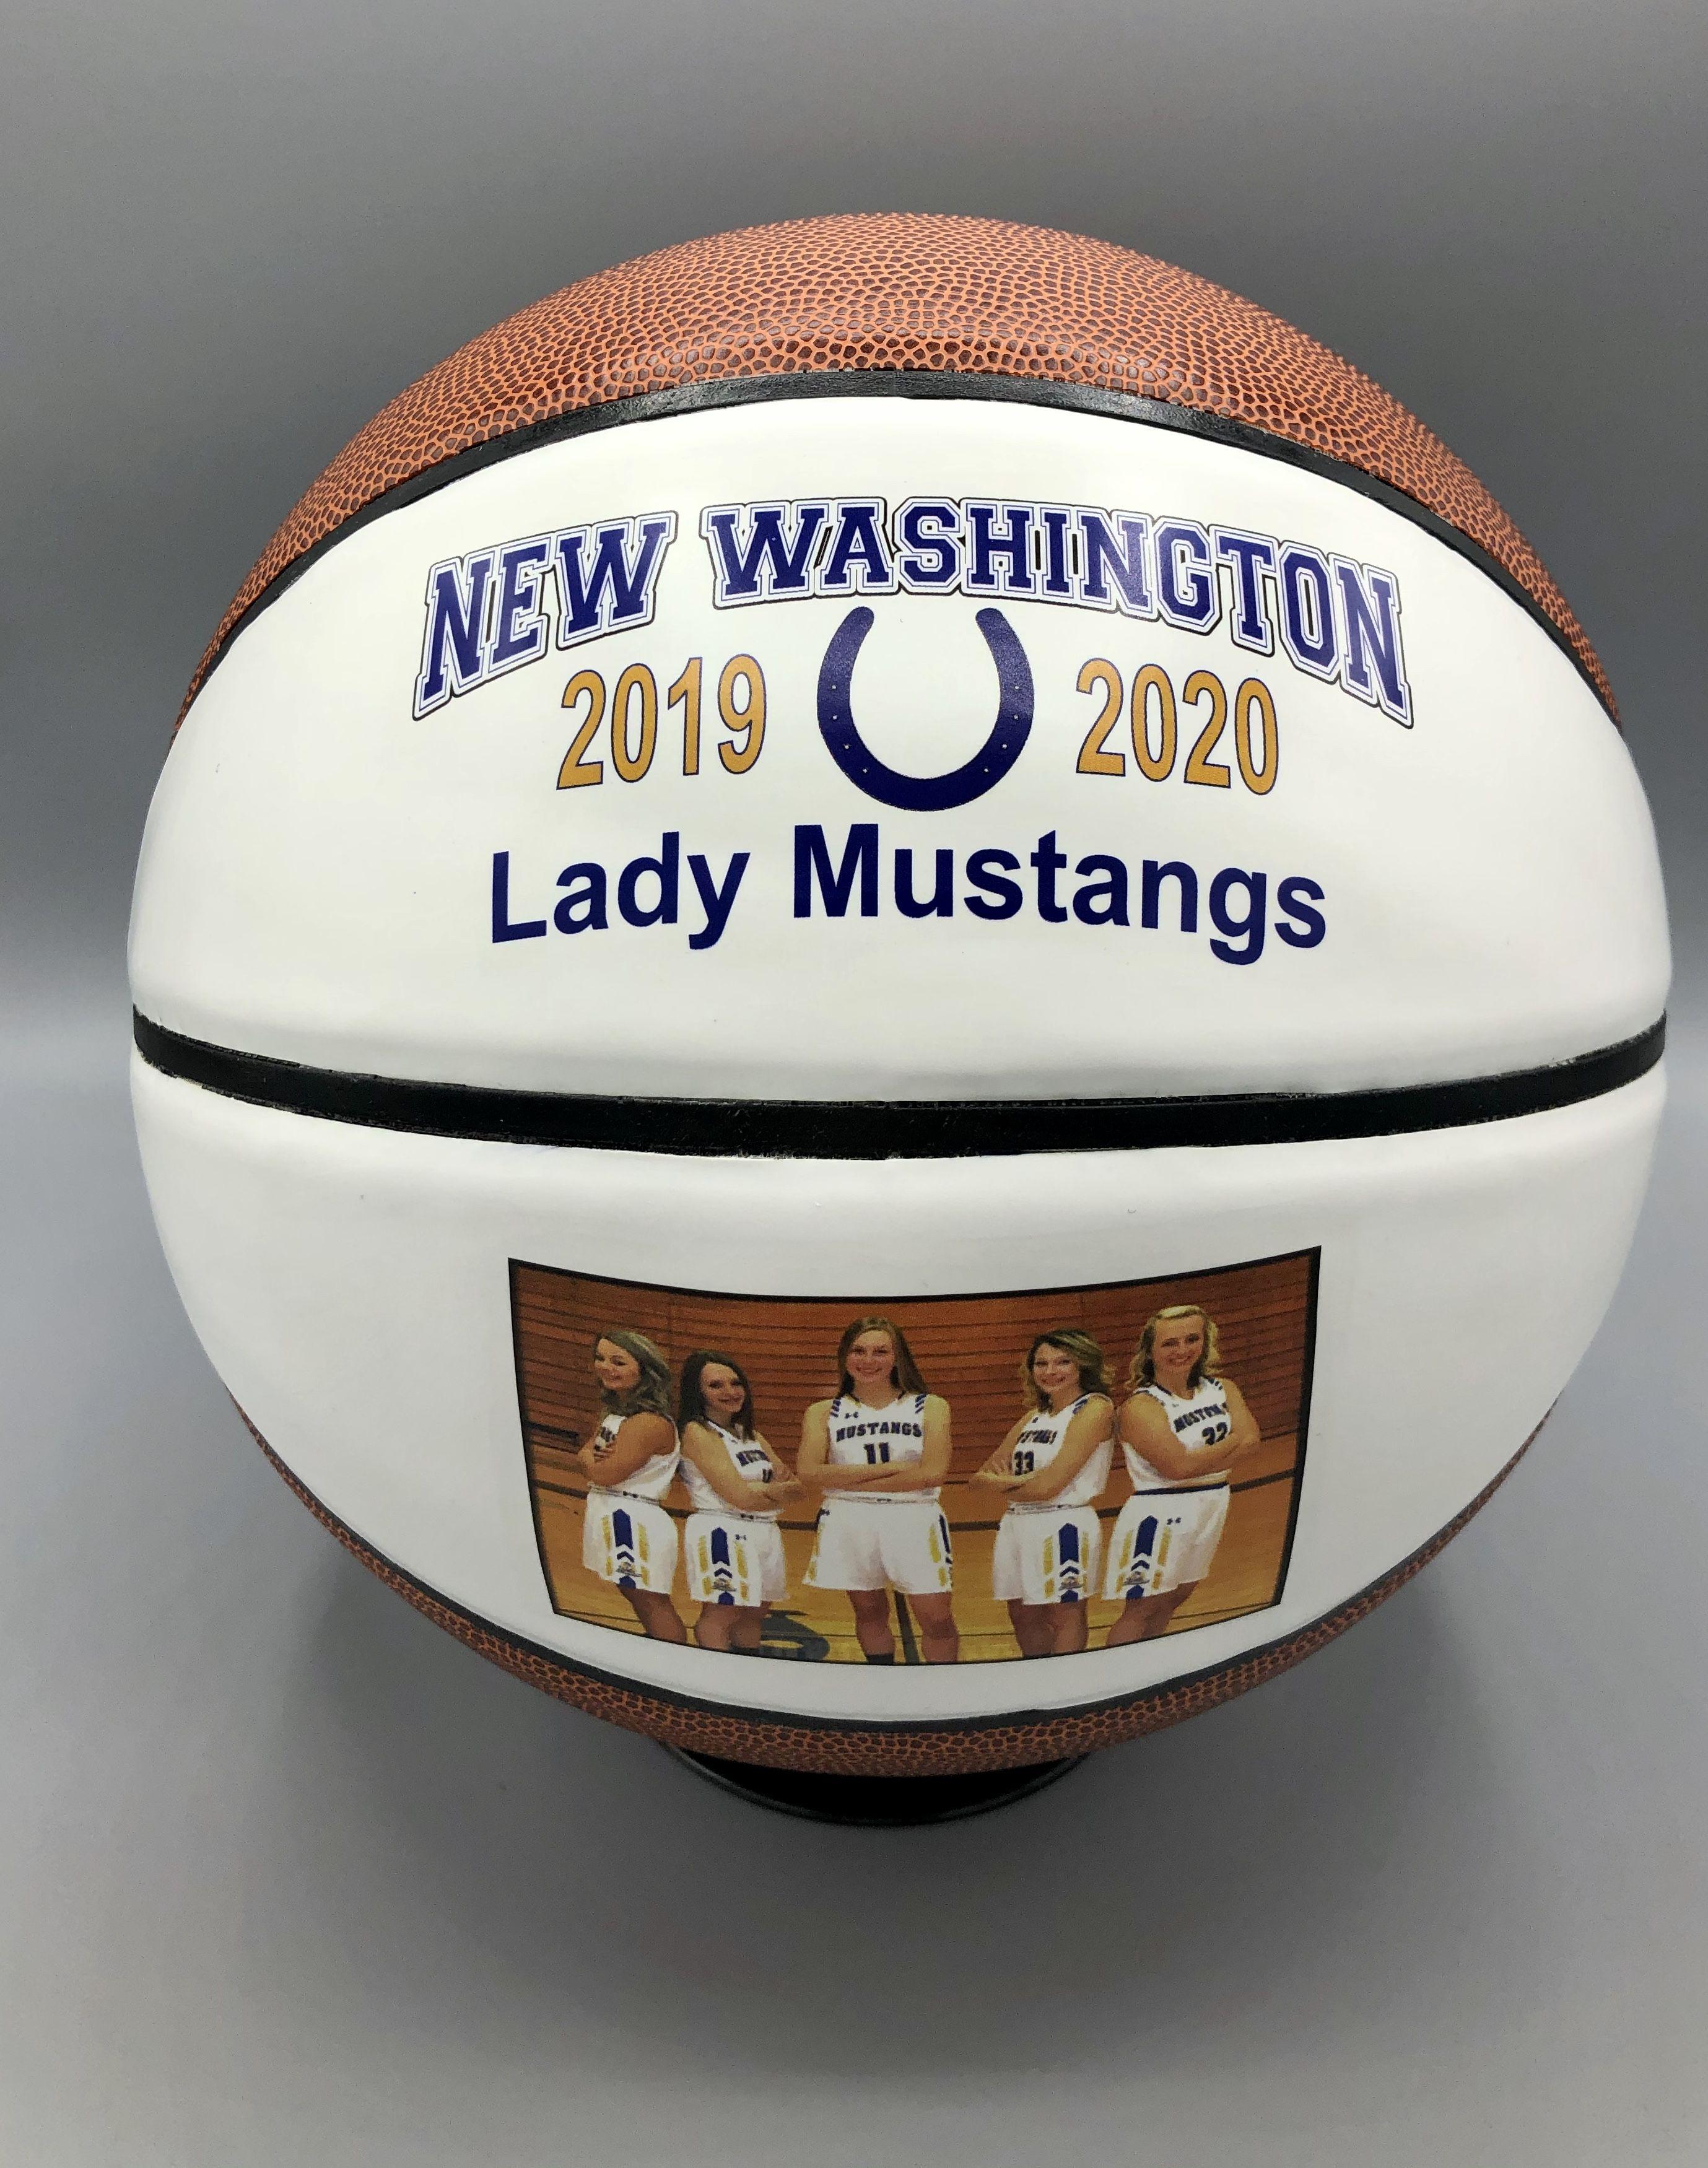 Custom made basketball makes the perfect senior gift